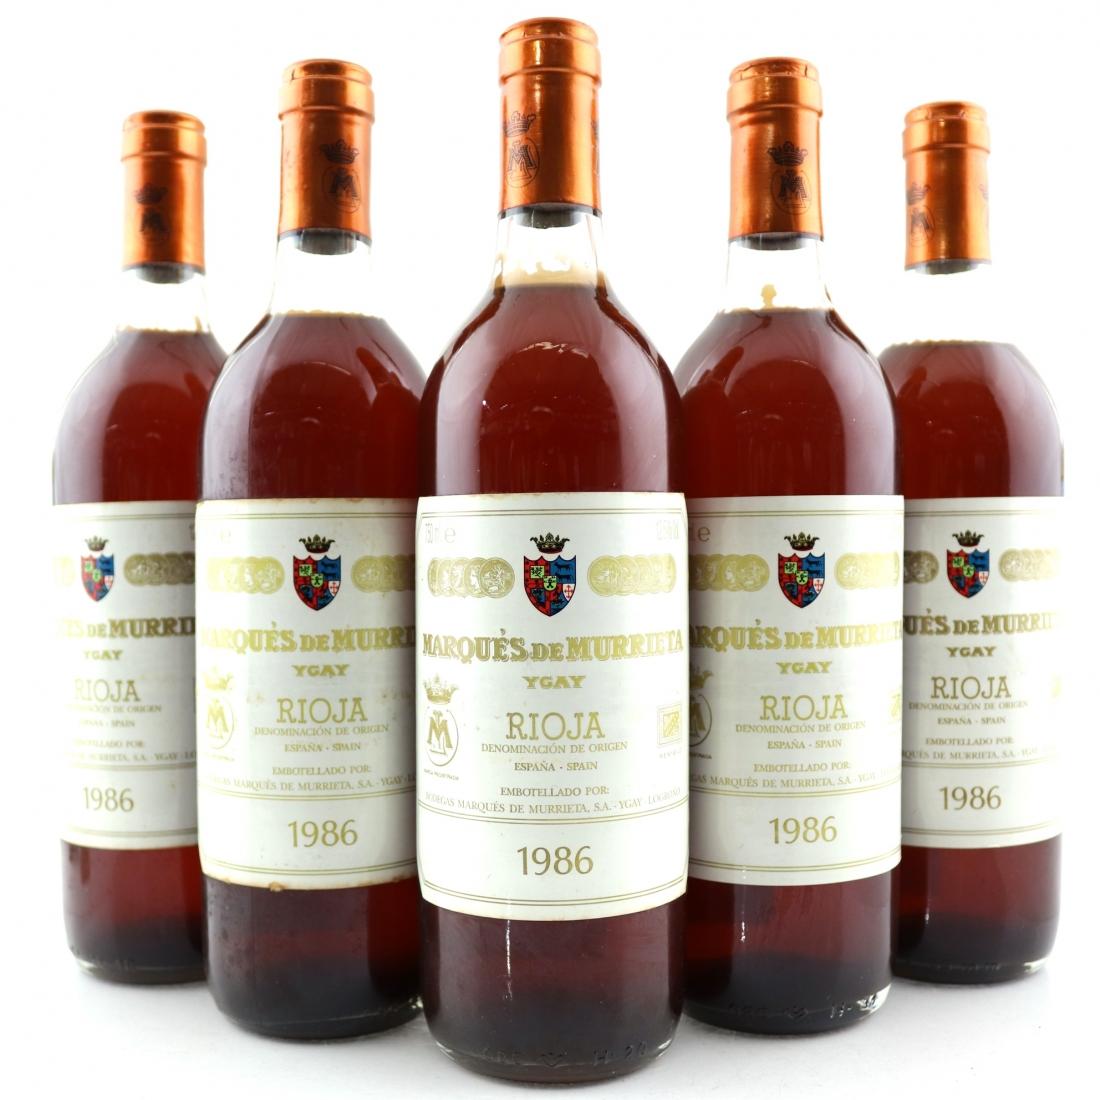 Marques De Murrieta 1986 Rioja Blanco Reserva 5x75cl